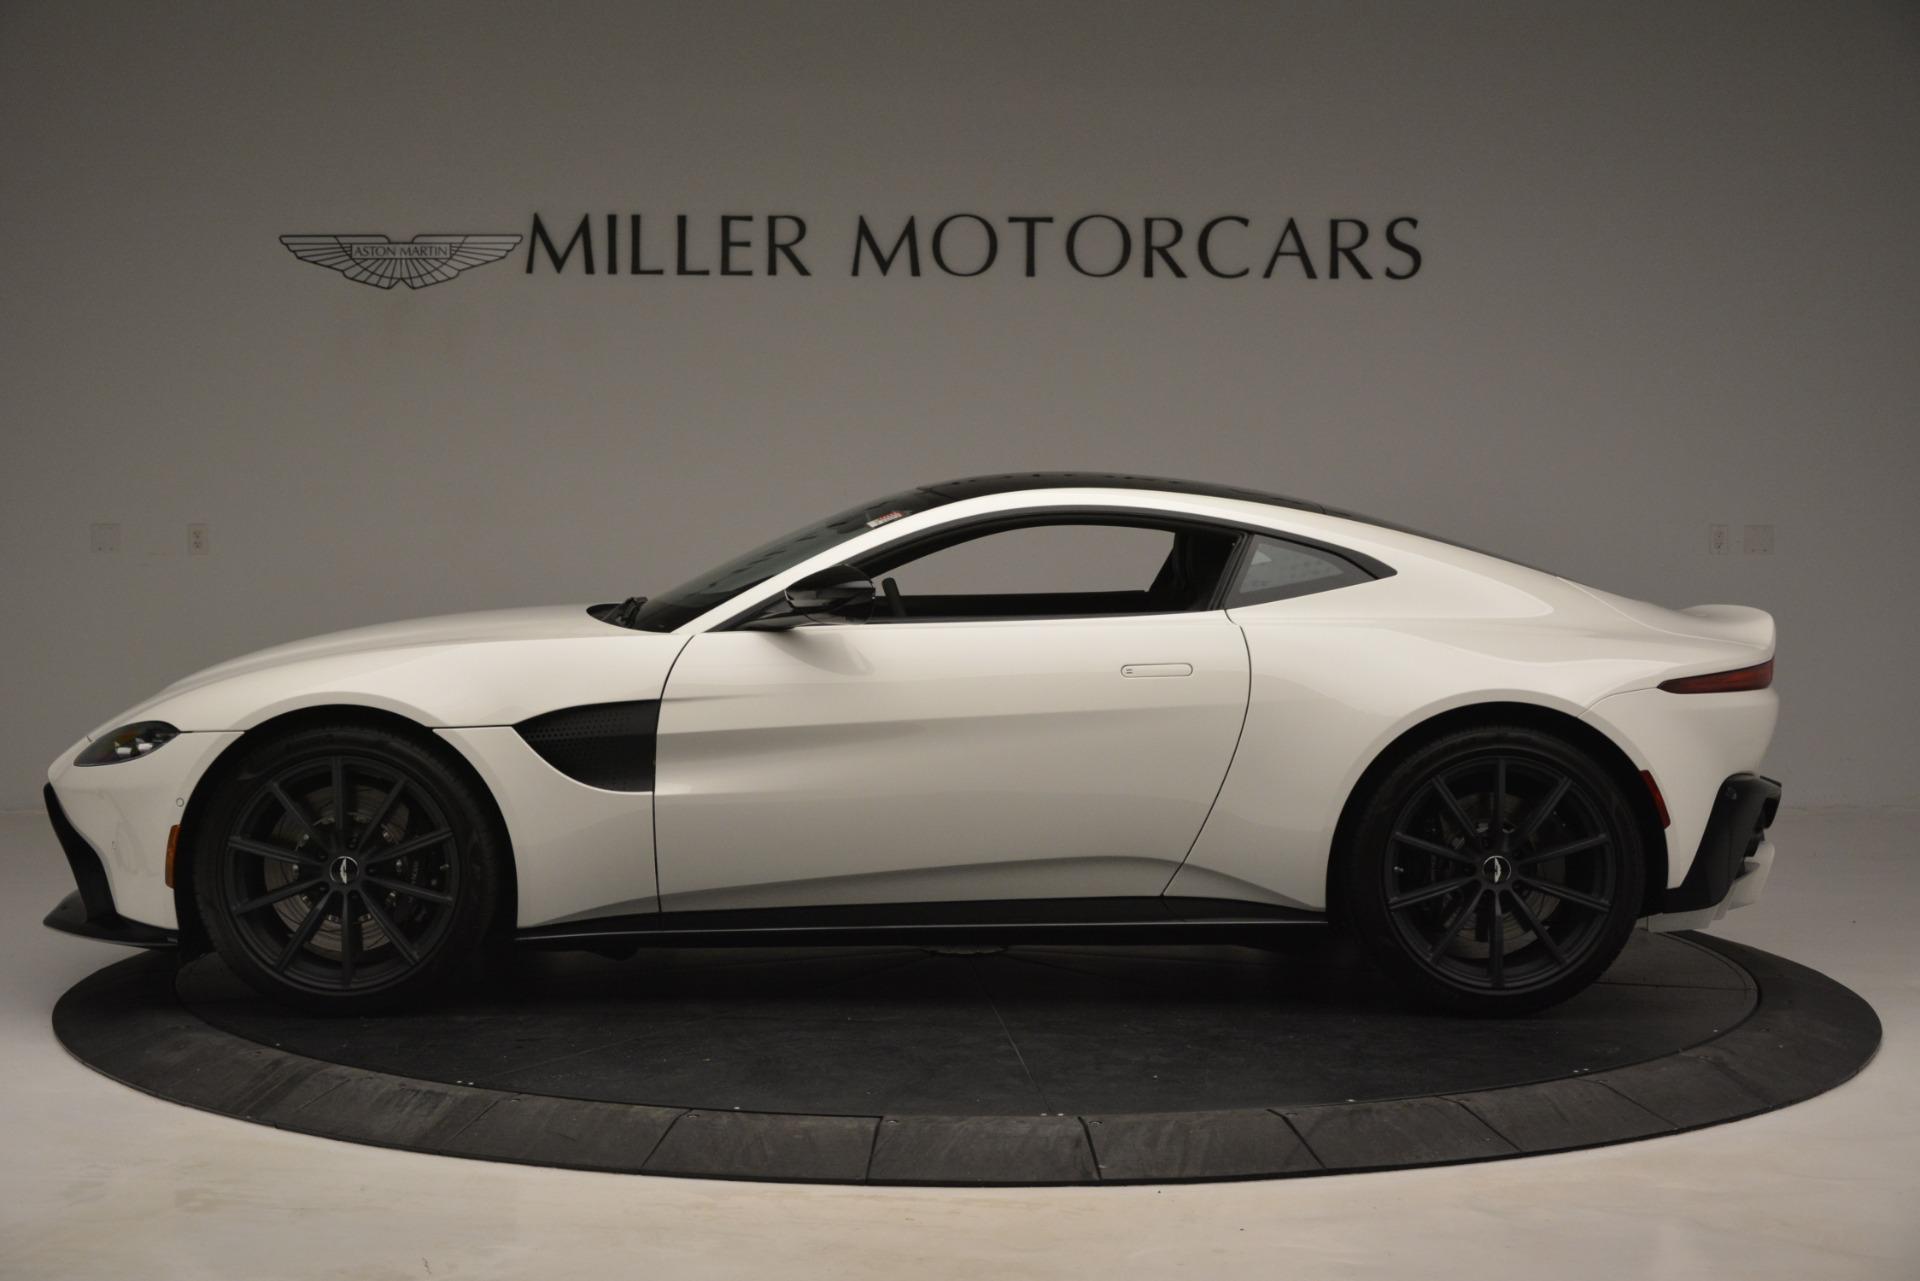 New 2019 Aston Martin Vantage Coupe For Sale In Greenwich, CT. Alfa Romeo of Greenwich, A1362 3053_p3